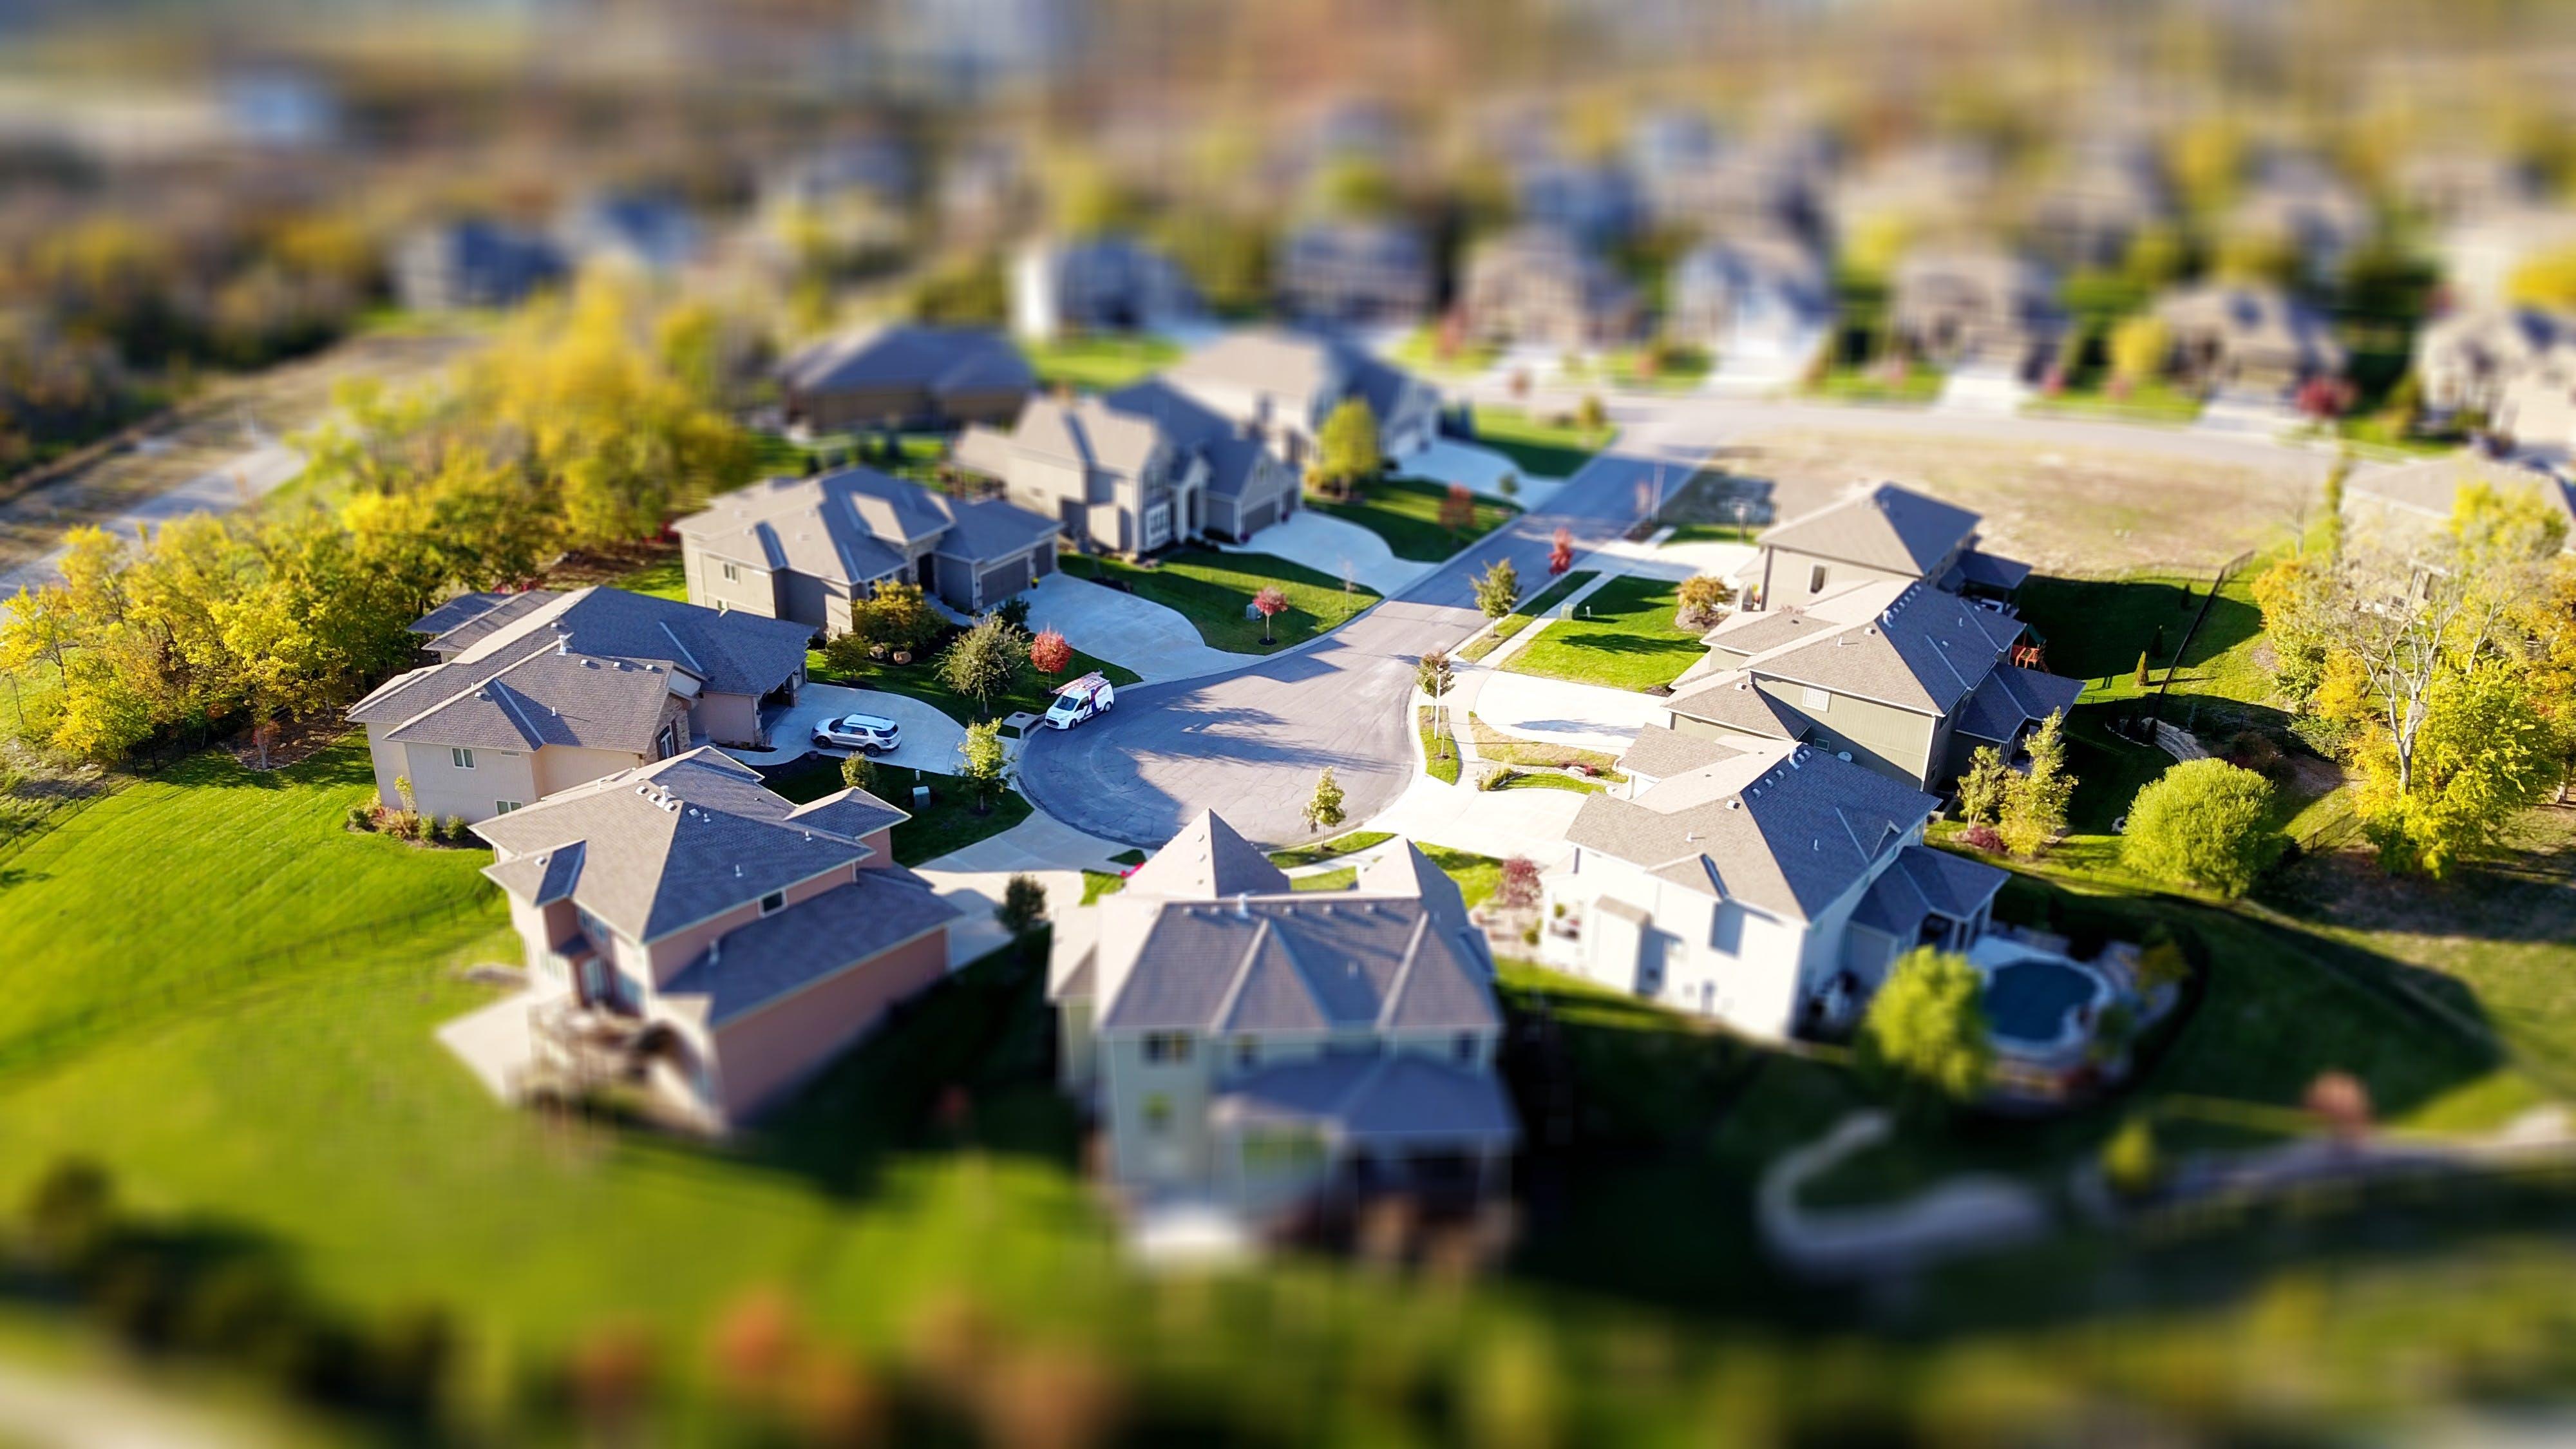 Free stock photo of houses, neighborhood, homes, real estate